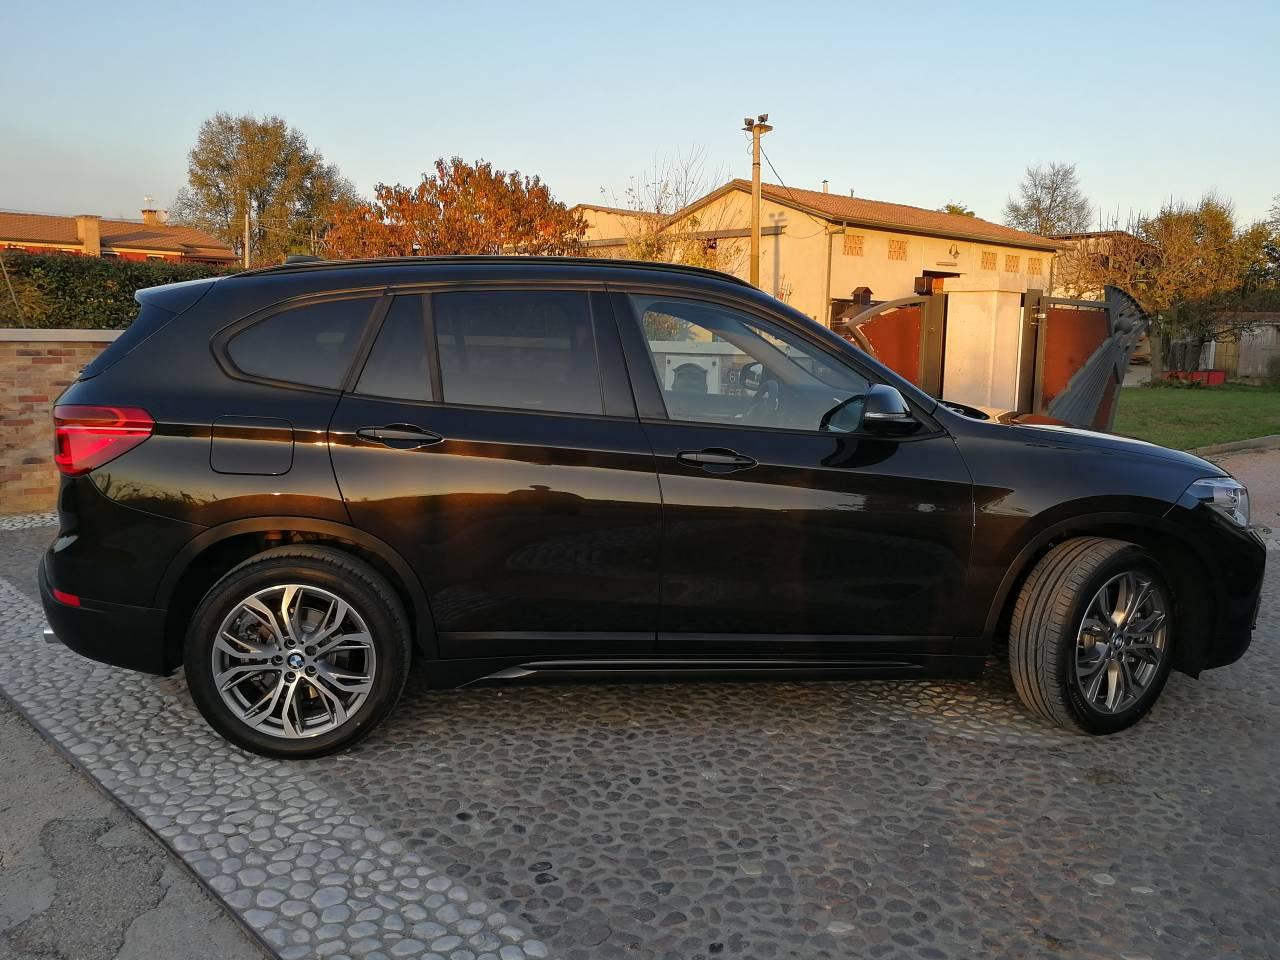 Bbriccardo - BMW X1 25D, appena uscita dalla concessionaria :)  688a6ac5b8150540aeeeaea42e80d429